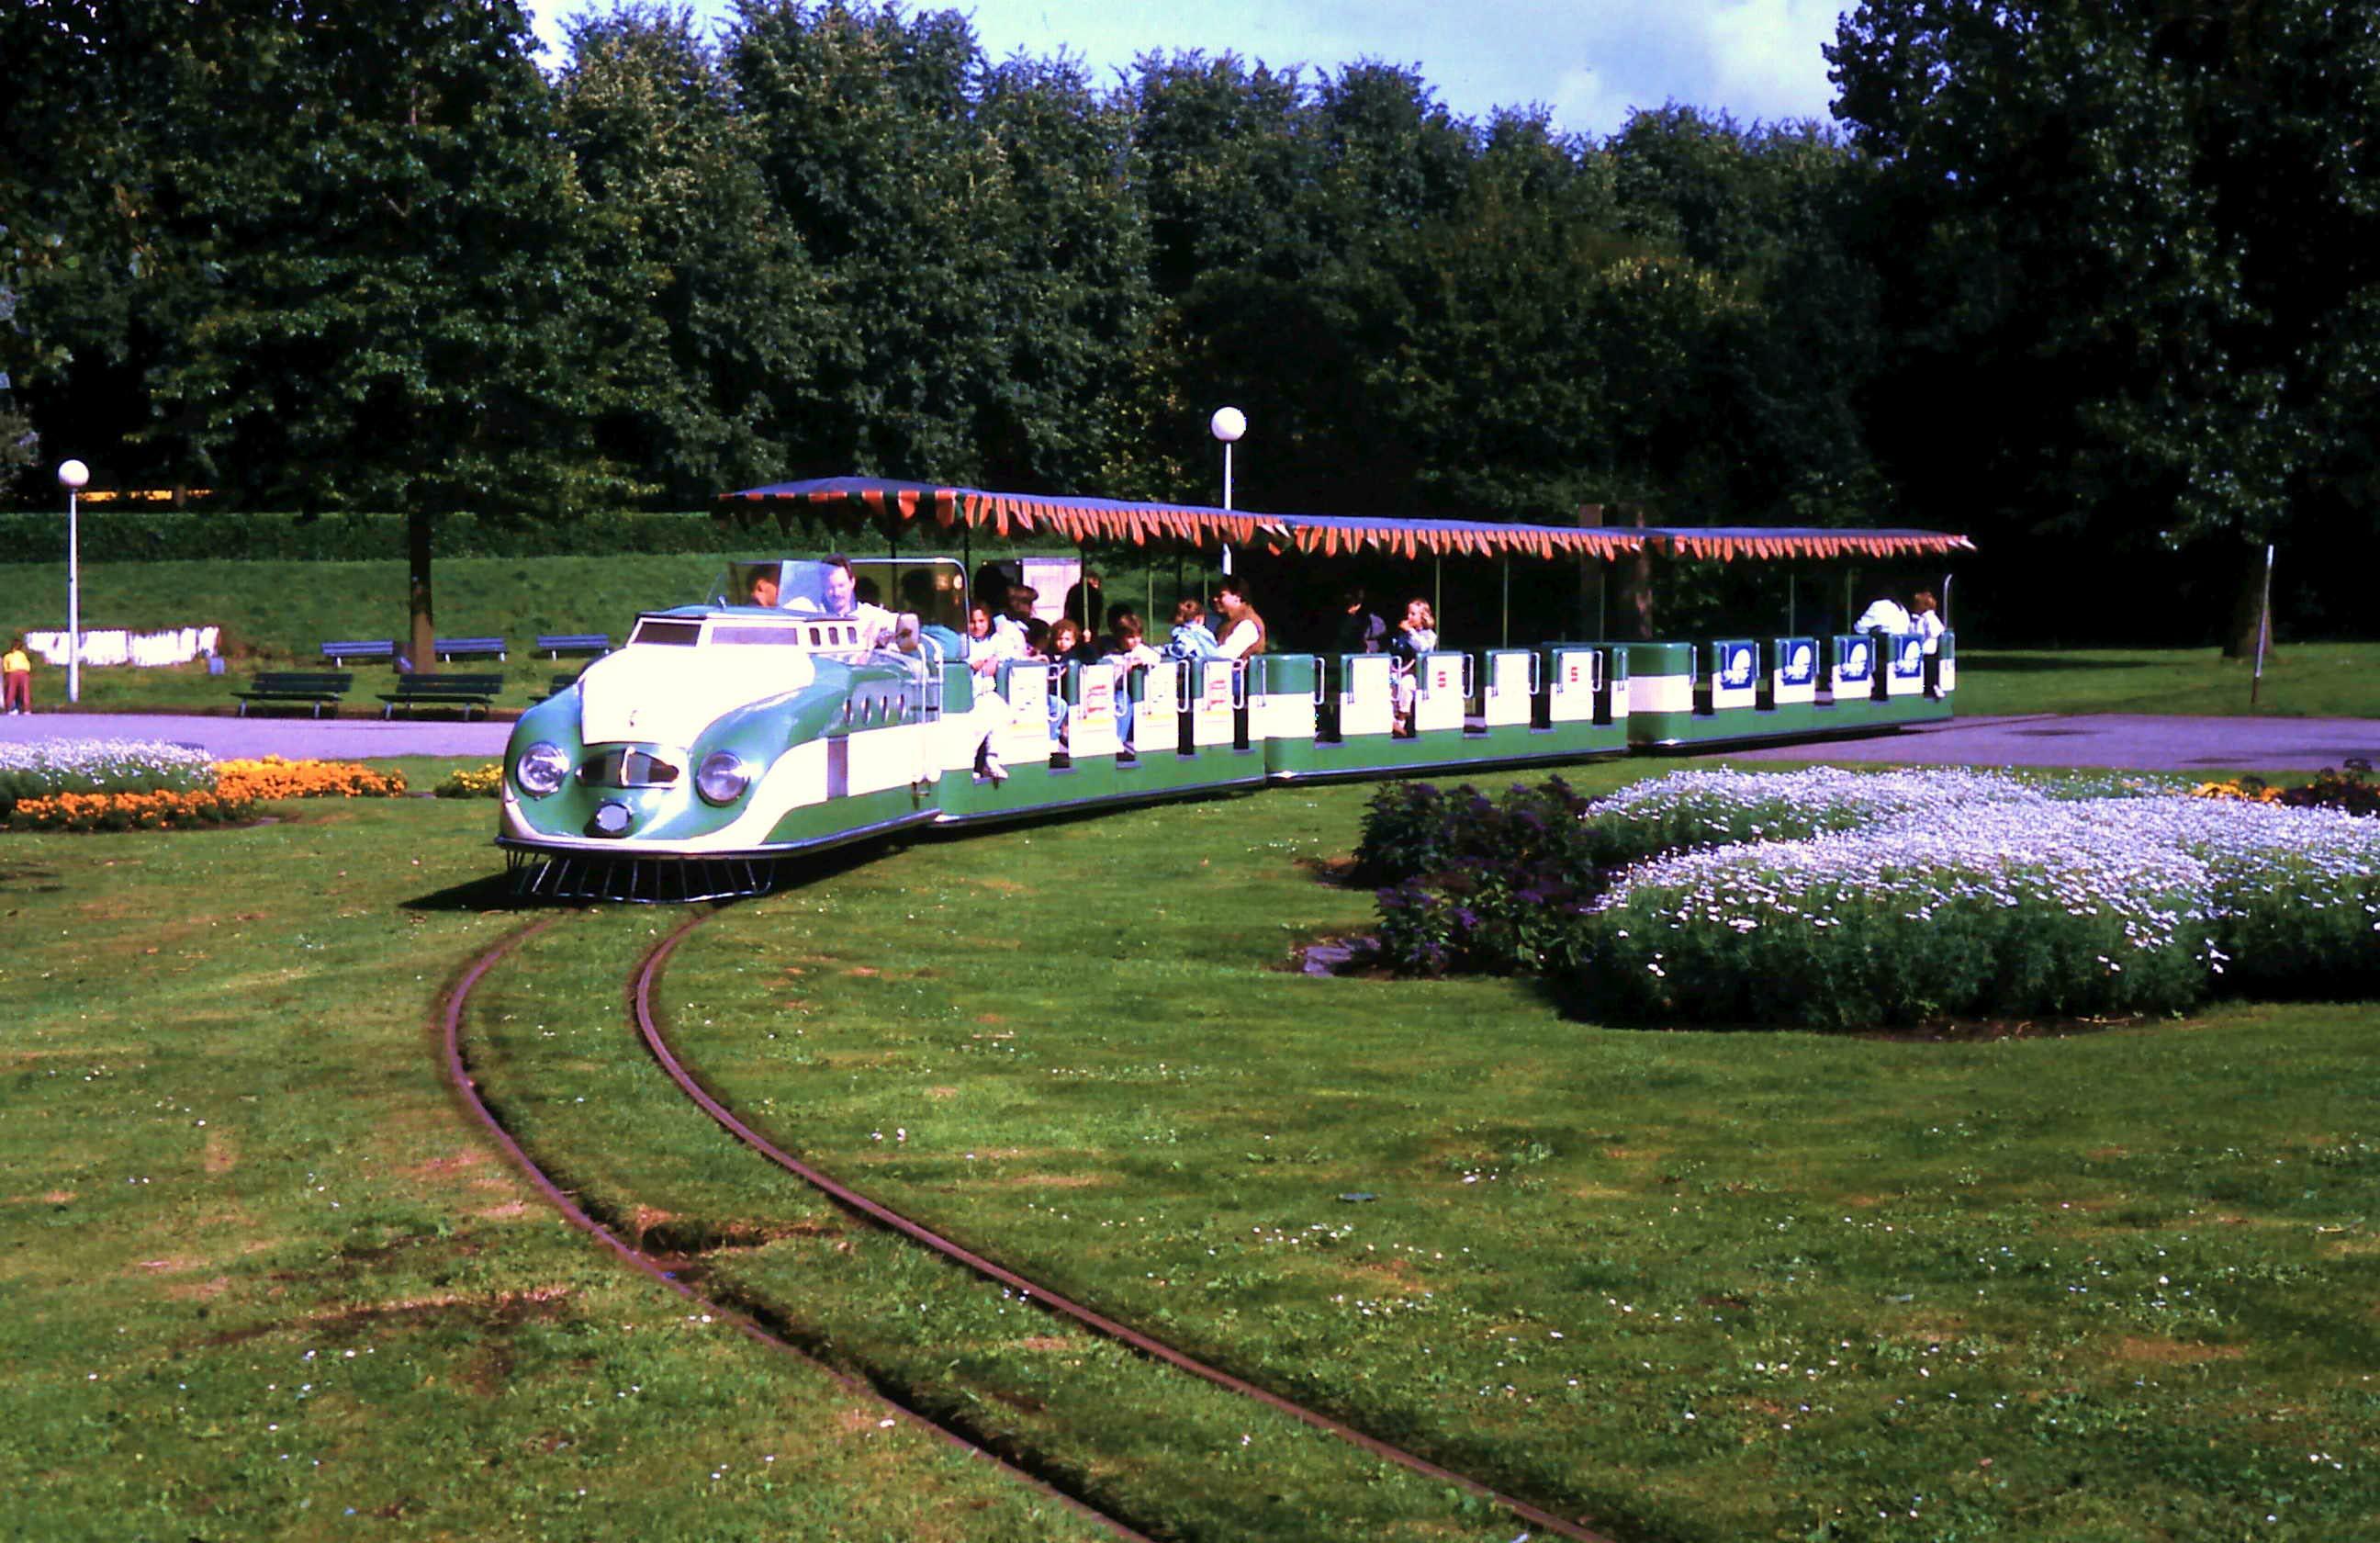 floriade 1972 amsterdam